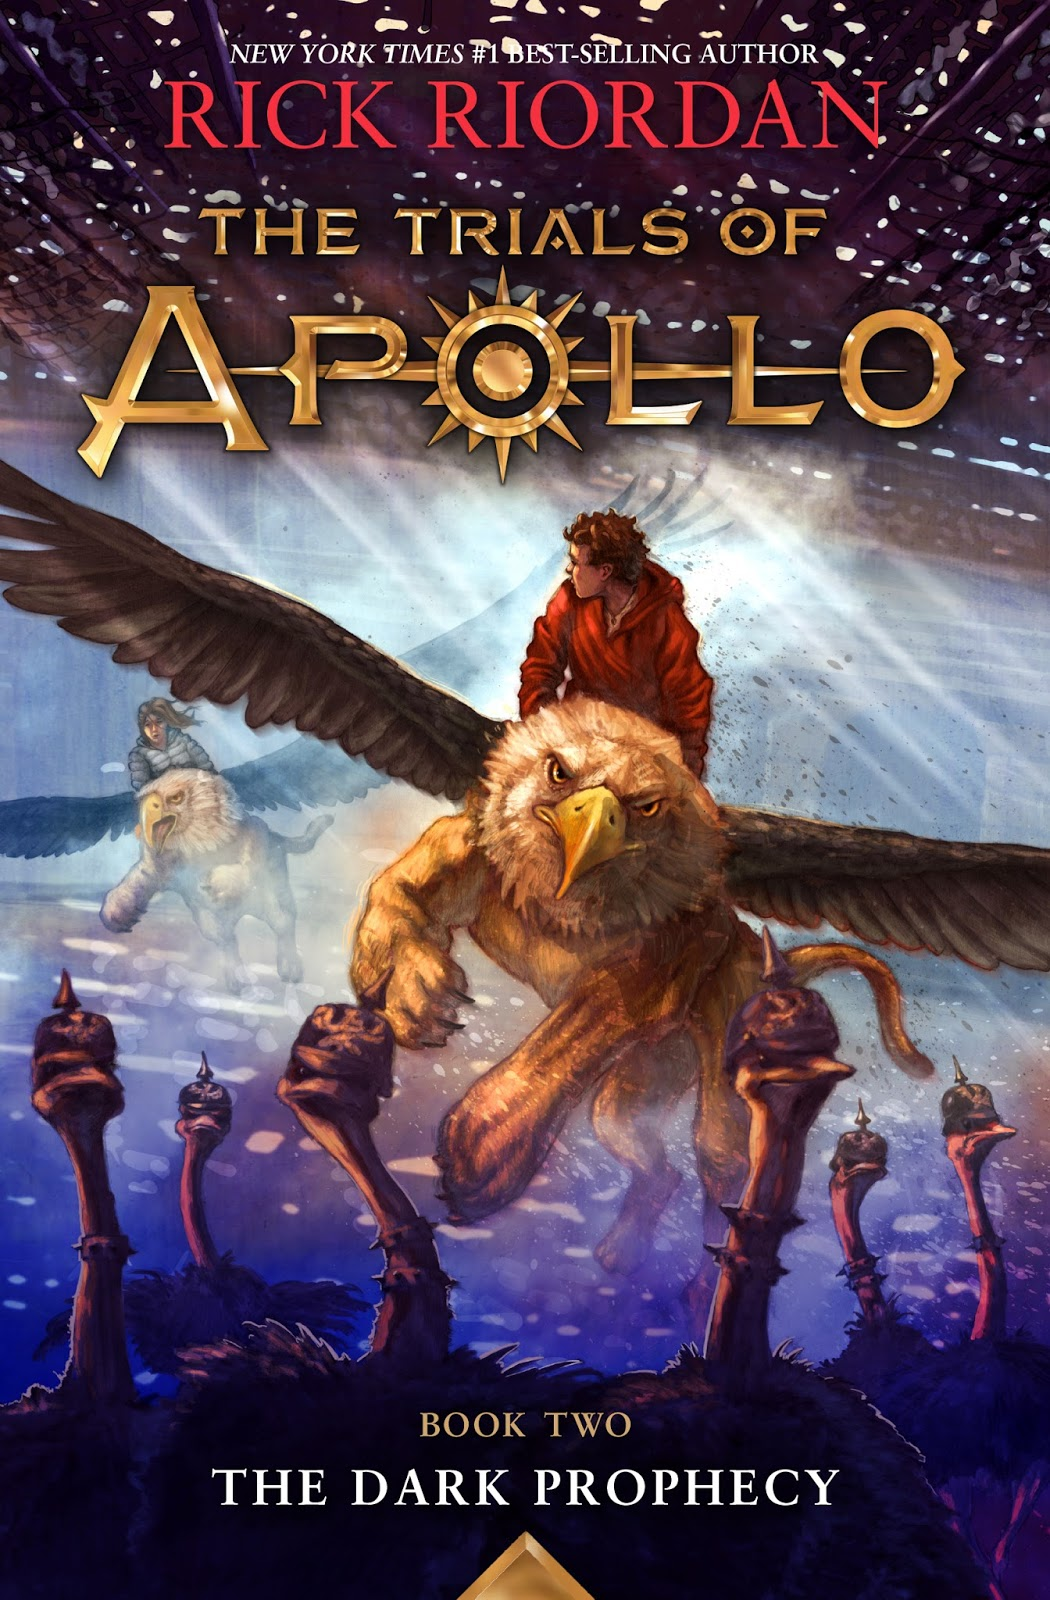 The Trials of Apollo: The Dark Prophecy by Rick Riordan